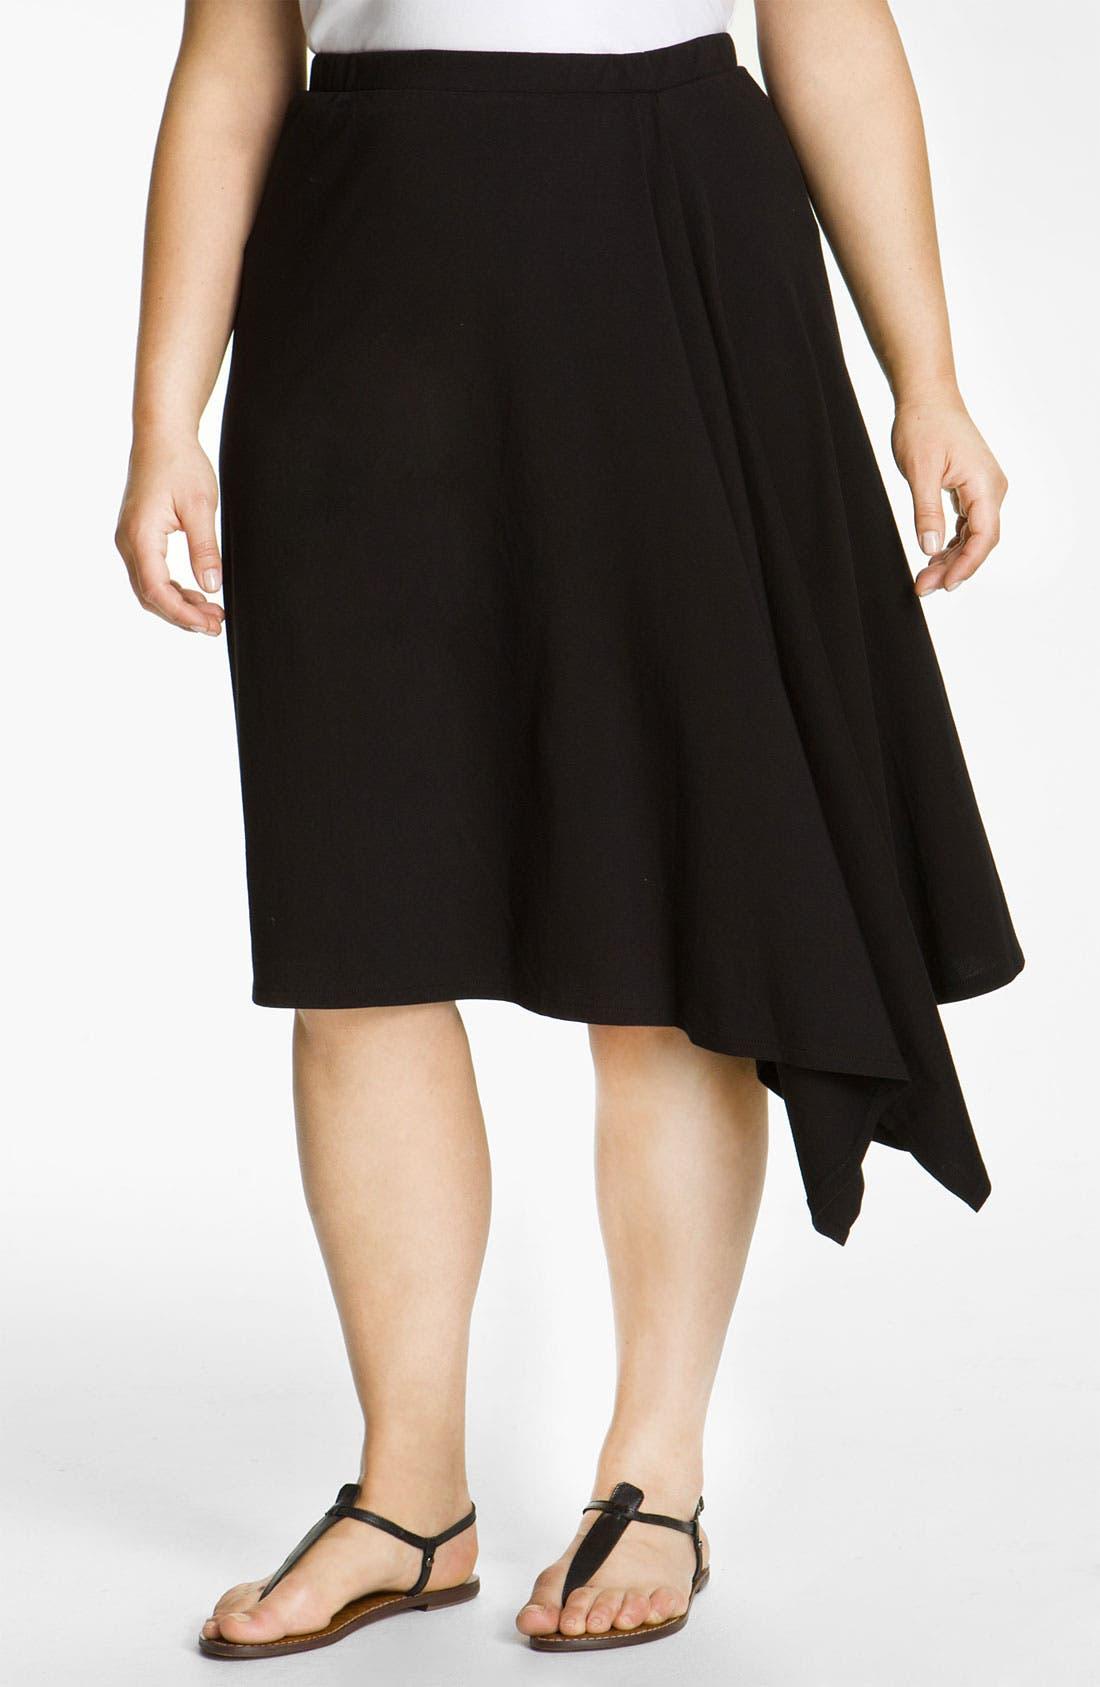 Alternate Image 1 Selected - DKNYC Drape Front Skirt (Plus)